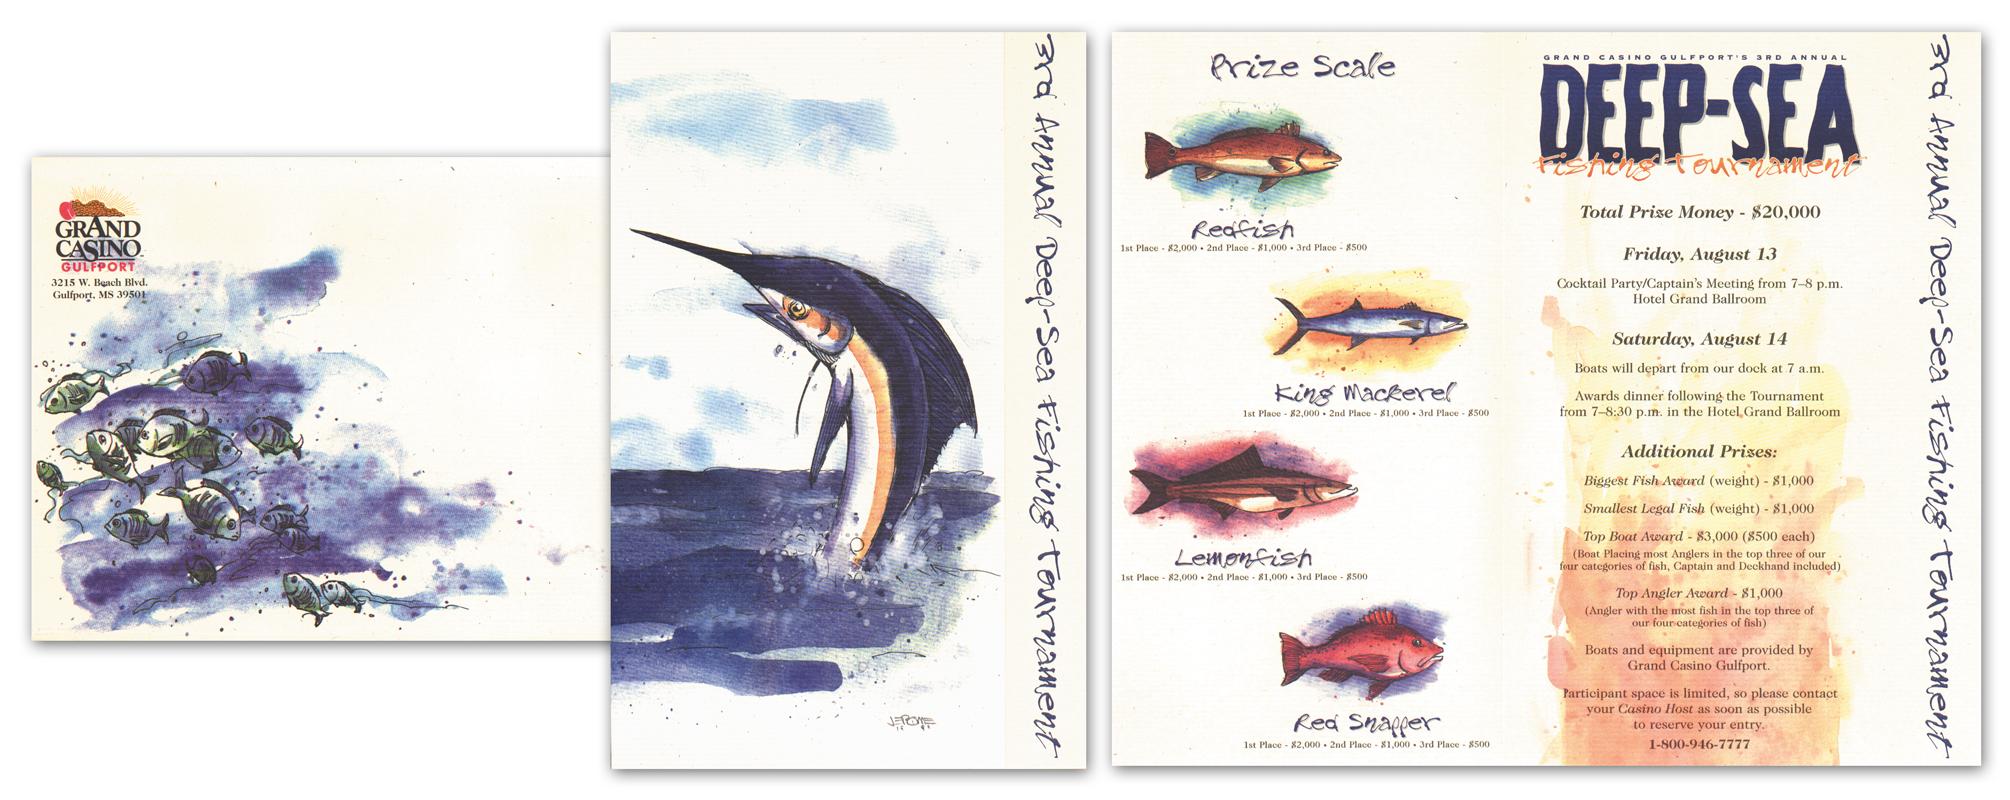 3RD ANNUAL DEEP-SEA FISHING INVITE